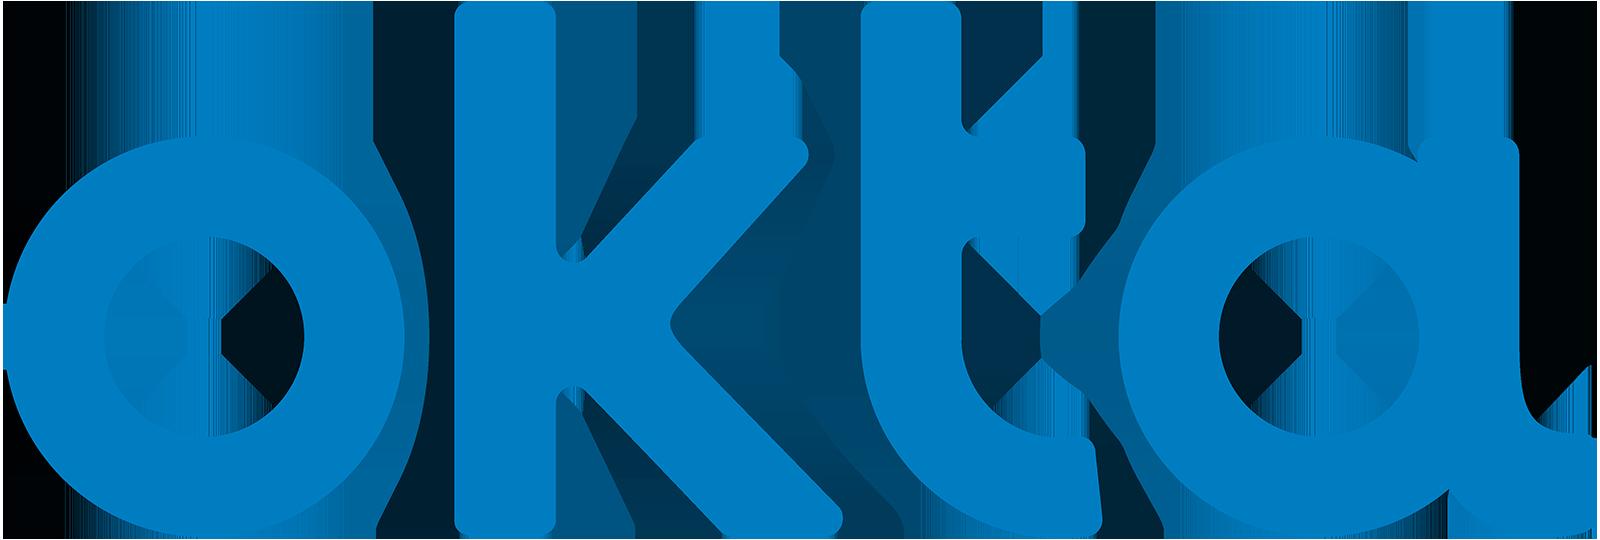 Okta_Logo_BrightBlue_Medium[1].png